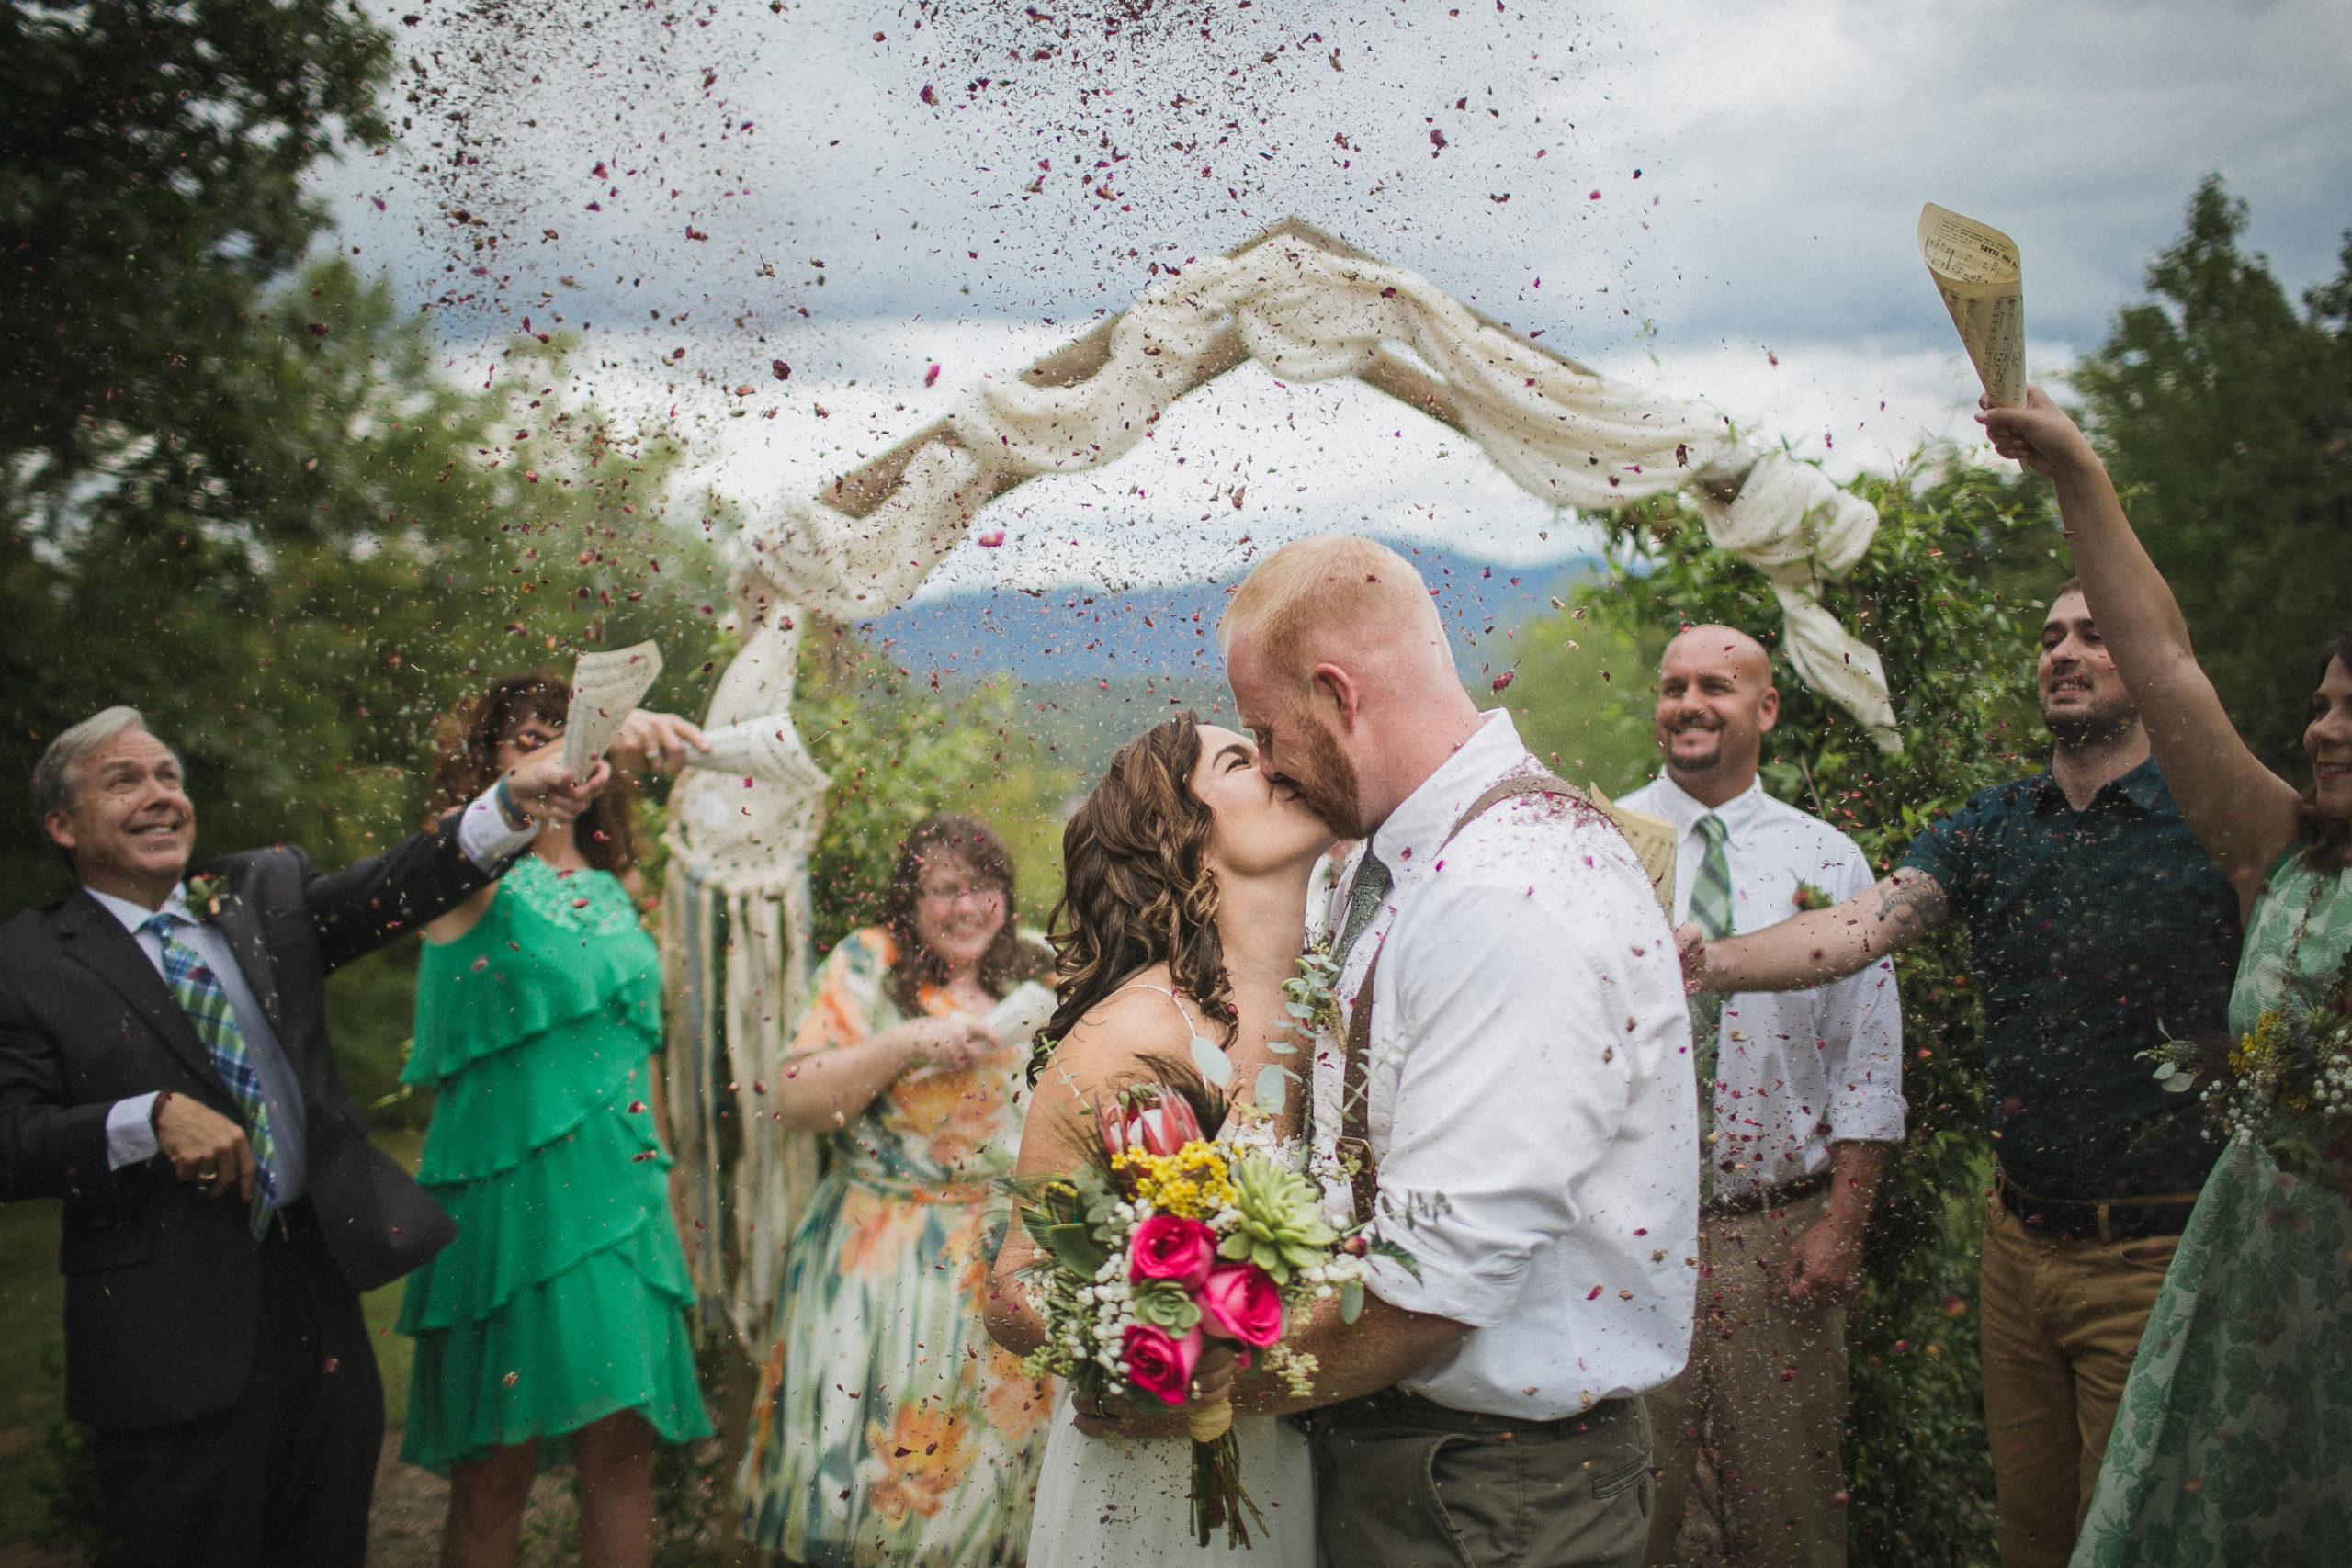 10 dicas de Roberto Cohen para uma festa de casamento perfeita